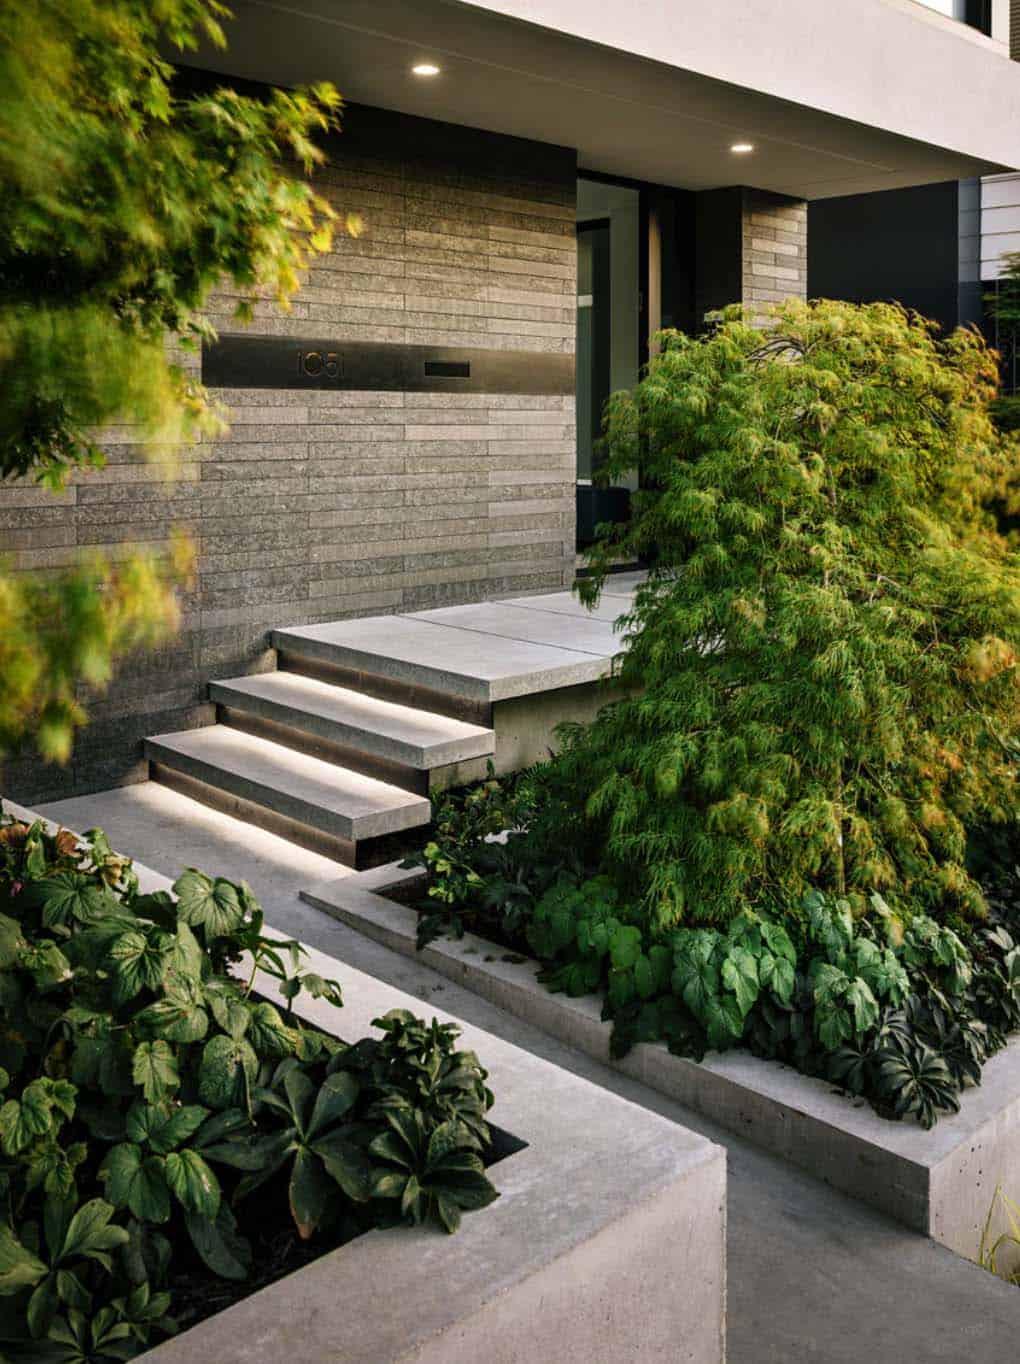 Mid-Century Modern Home-John Maniscalco Architecture-02-1 Kindesign